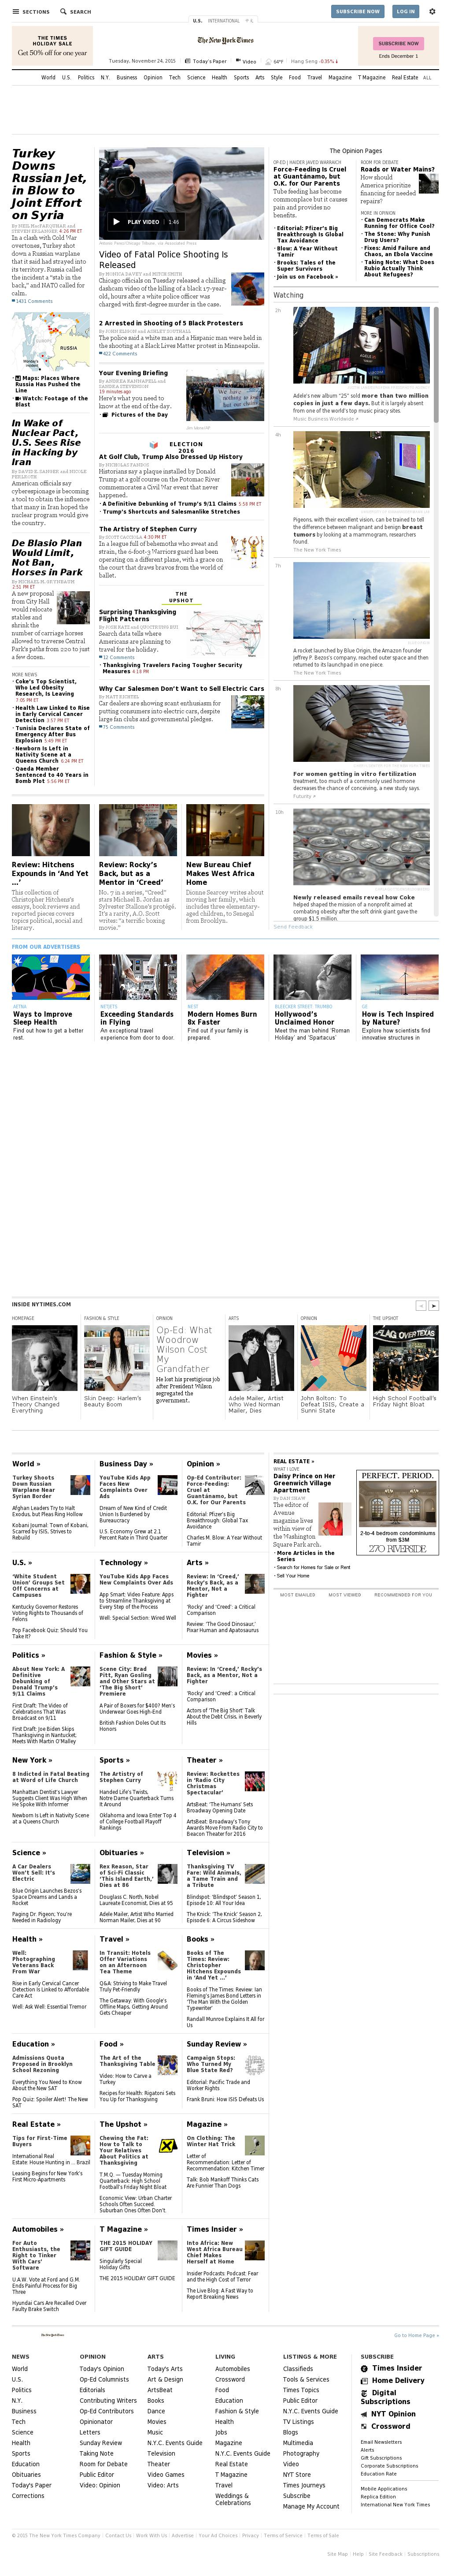 The New York Times at Wednesday Nov. 25, 2015, 1:15 a.m. UTC